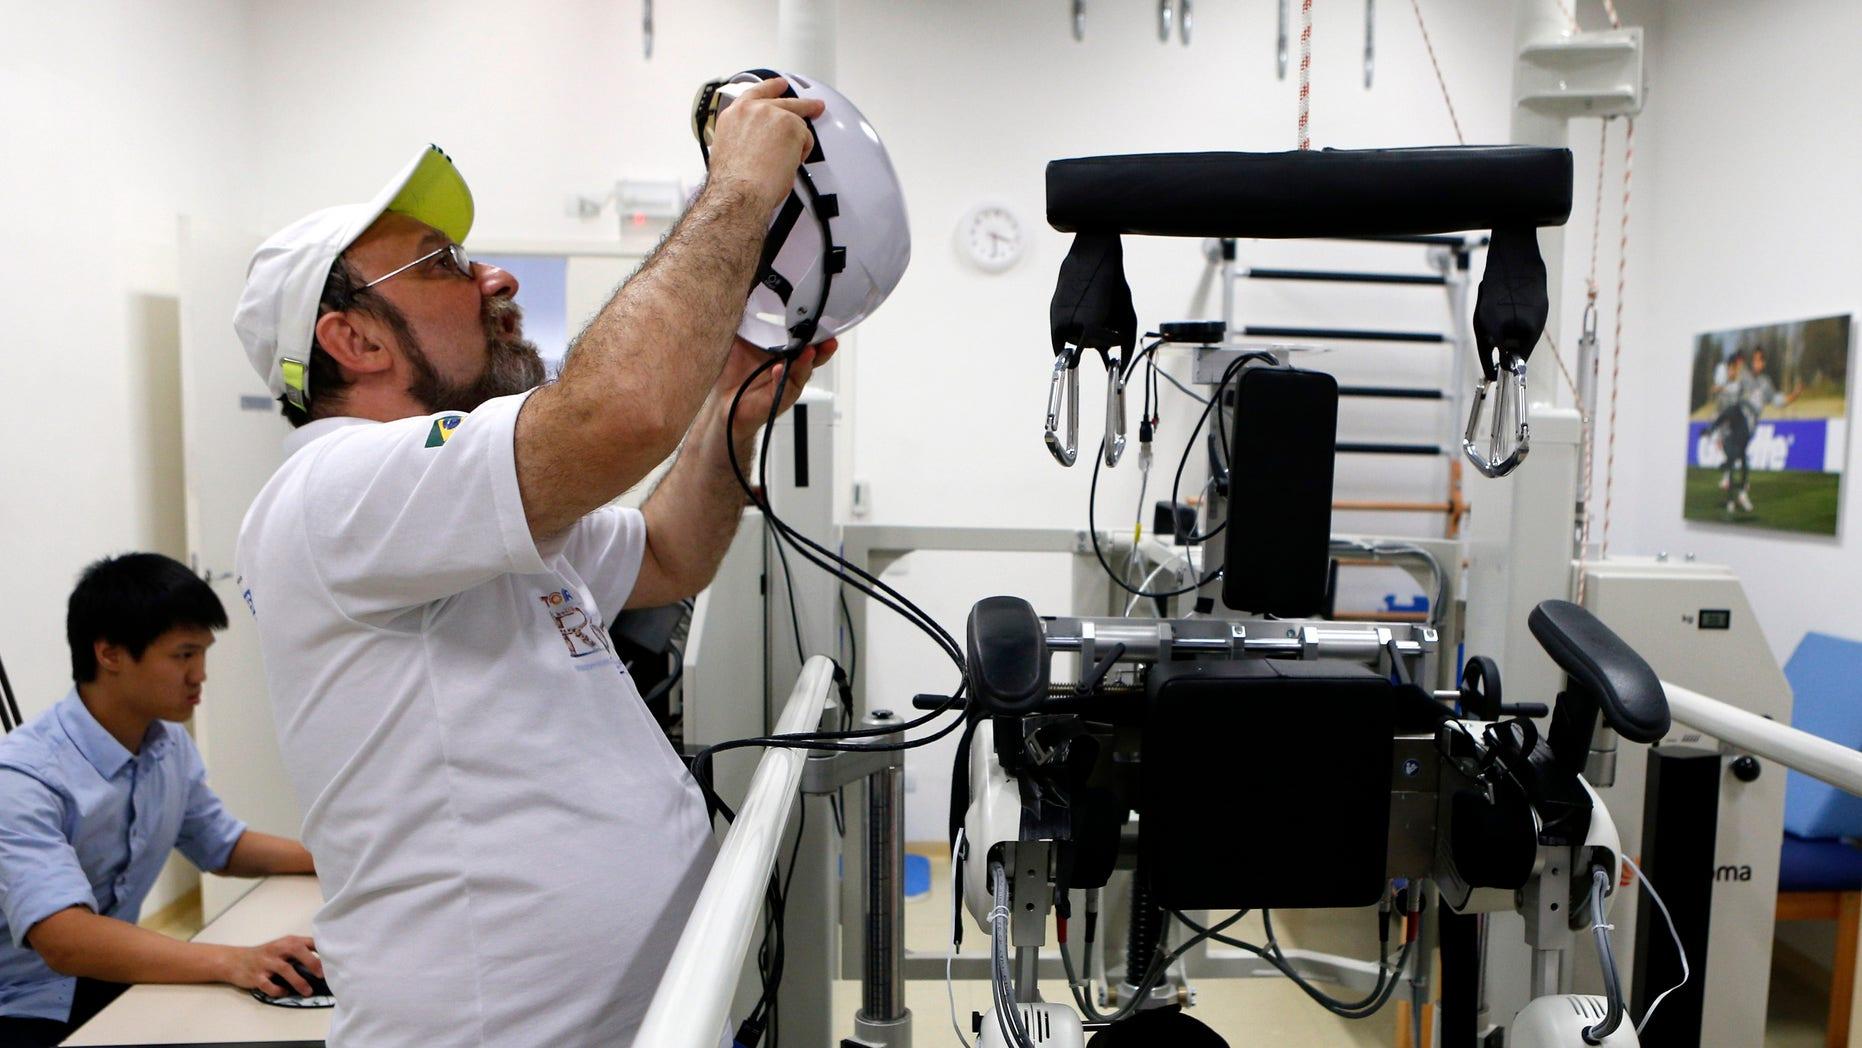 Brazilian neuroscientist Miguel Nicolelis works in his robotic laboratory in Sao Paulo May 21, 2014. (REUTERS/Paulo Whitaker)